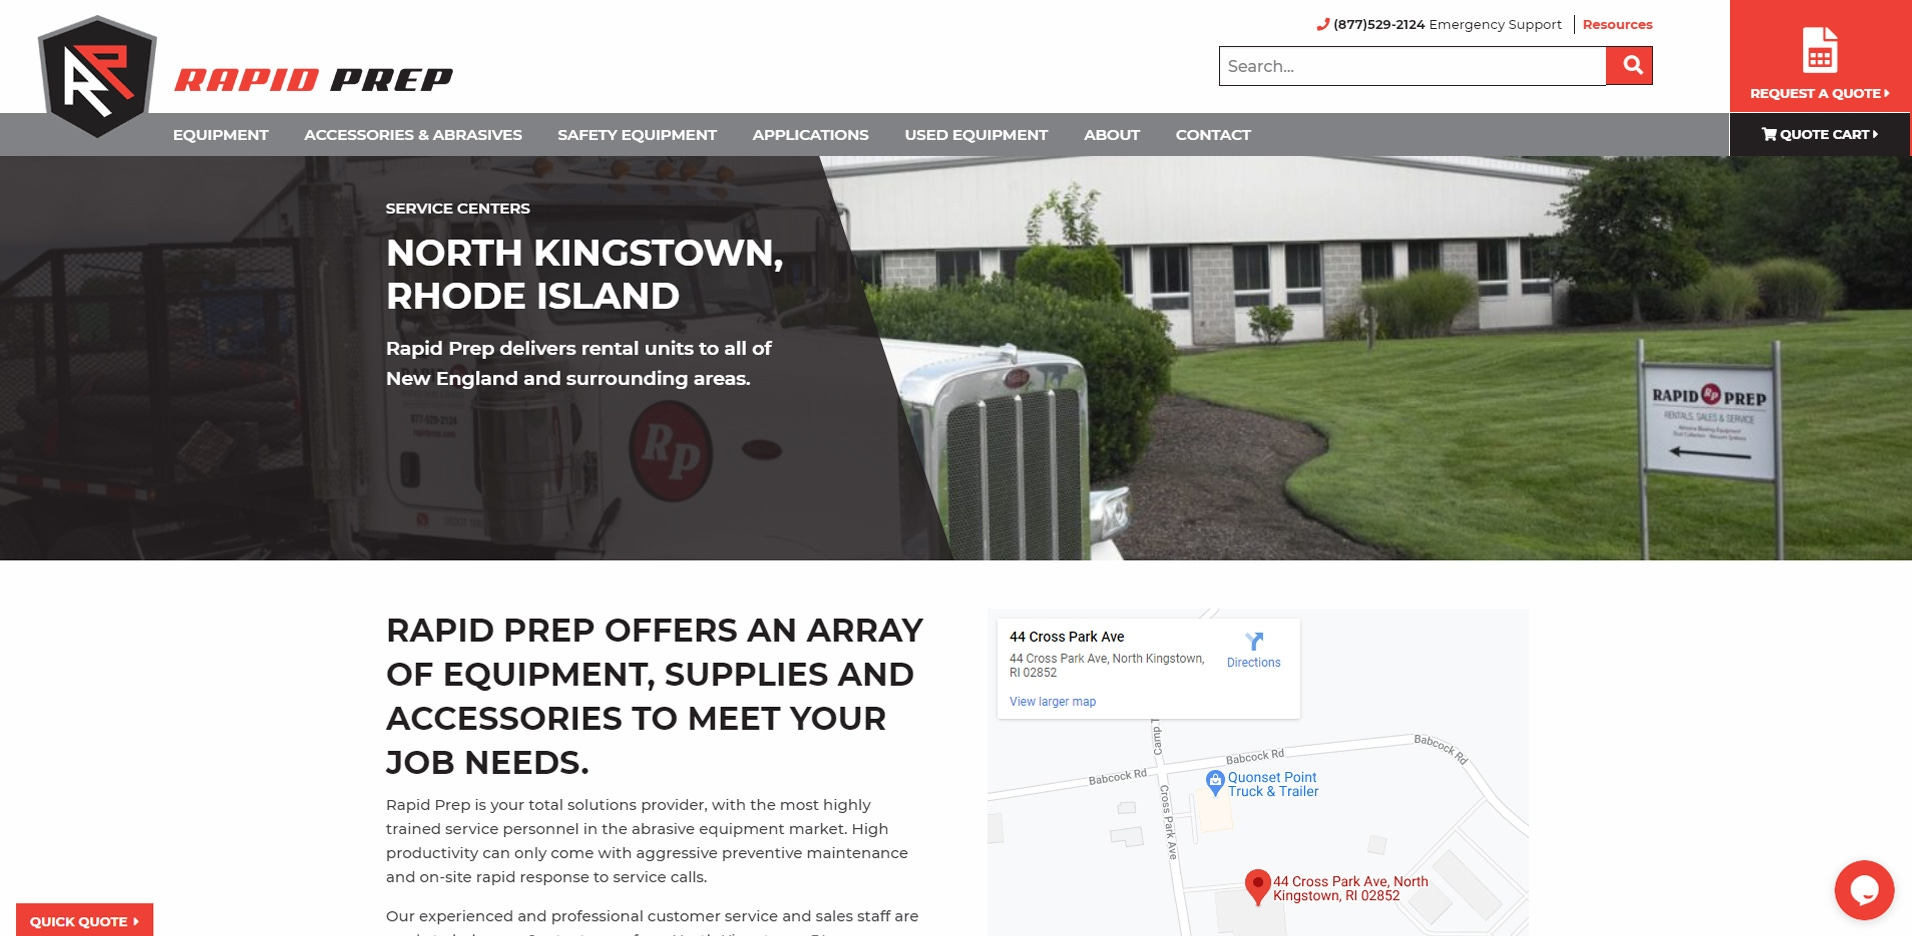 Rapid Prep location webpage